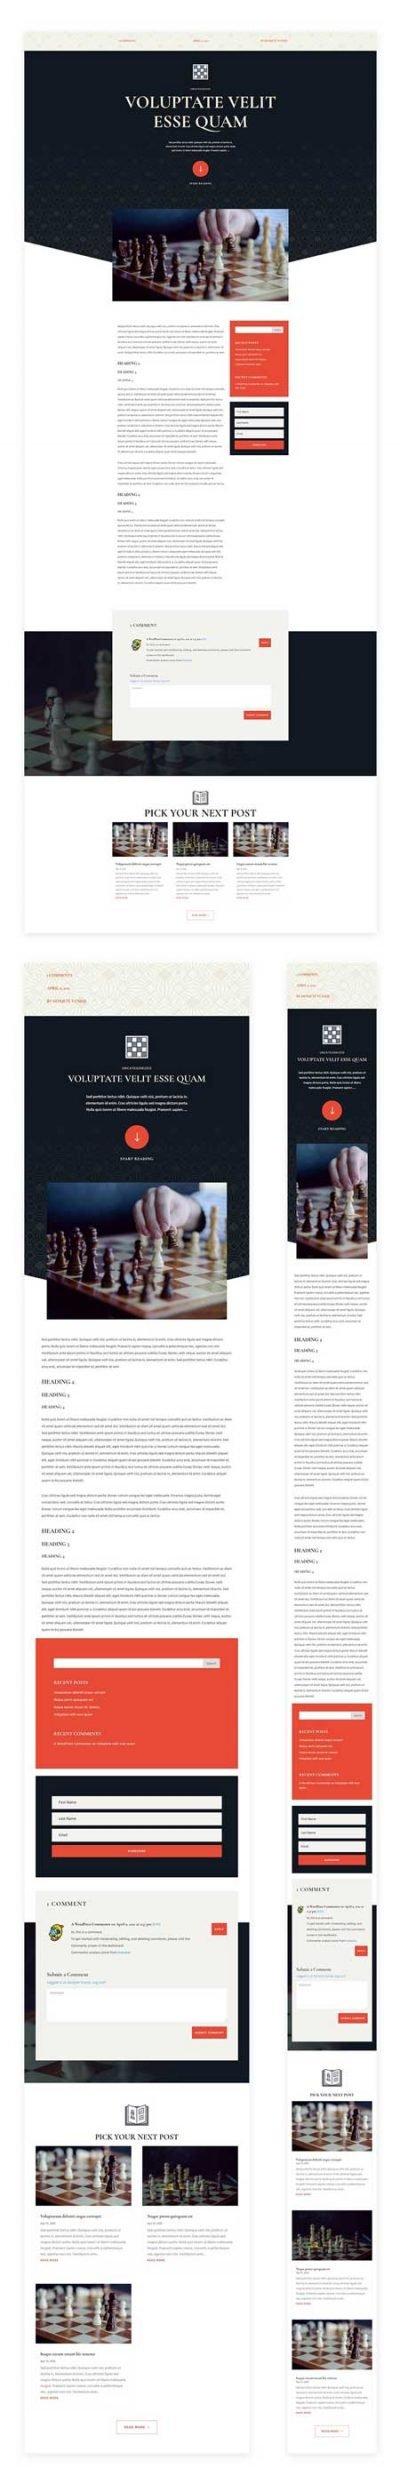 Divi chess club blog post template